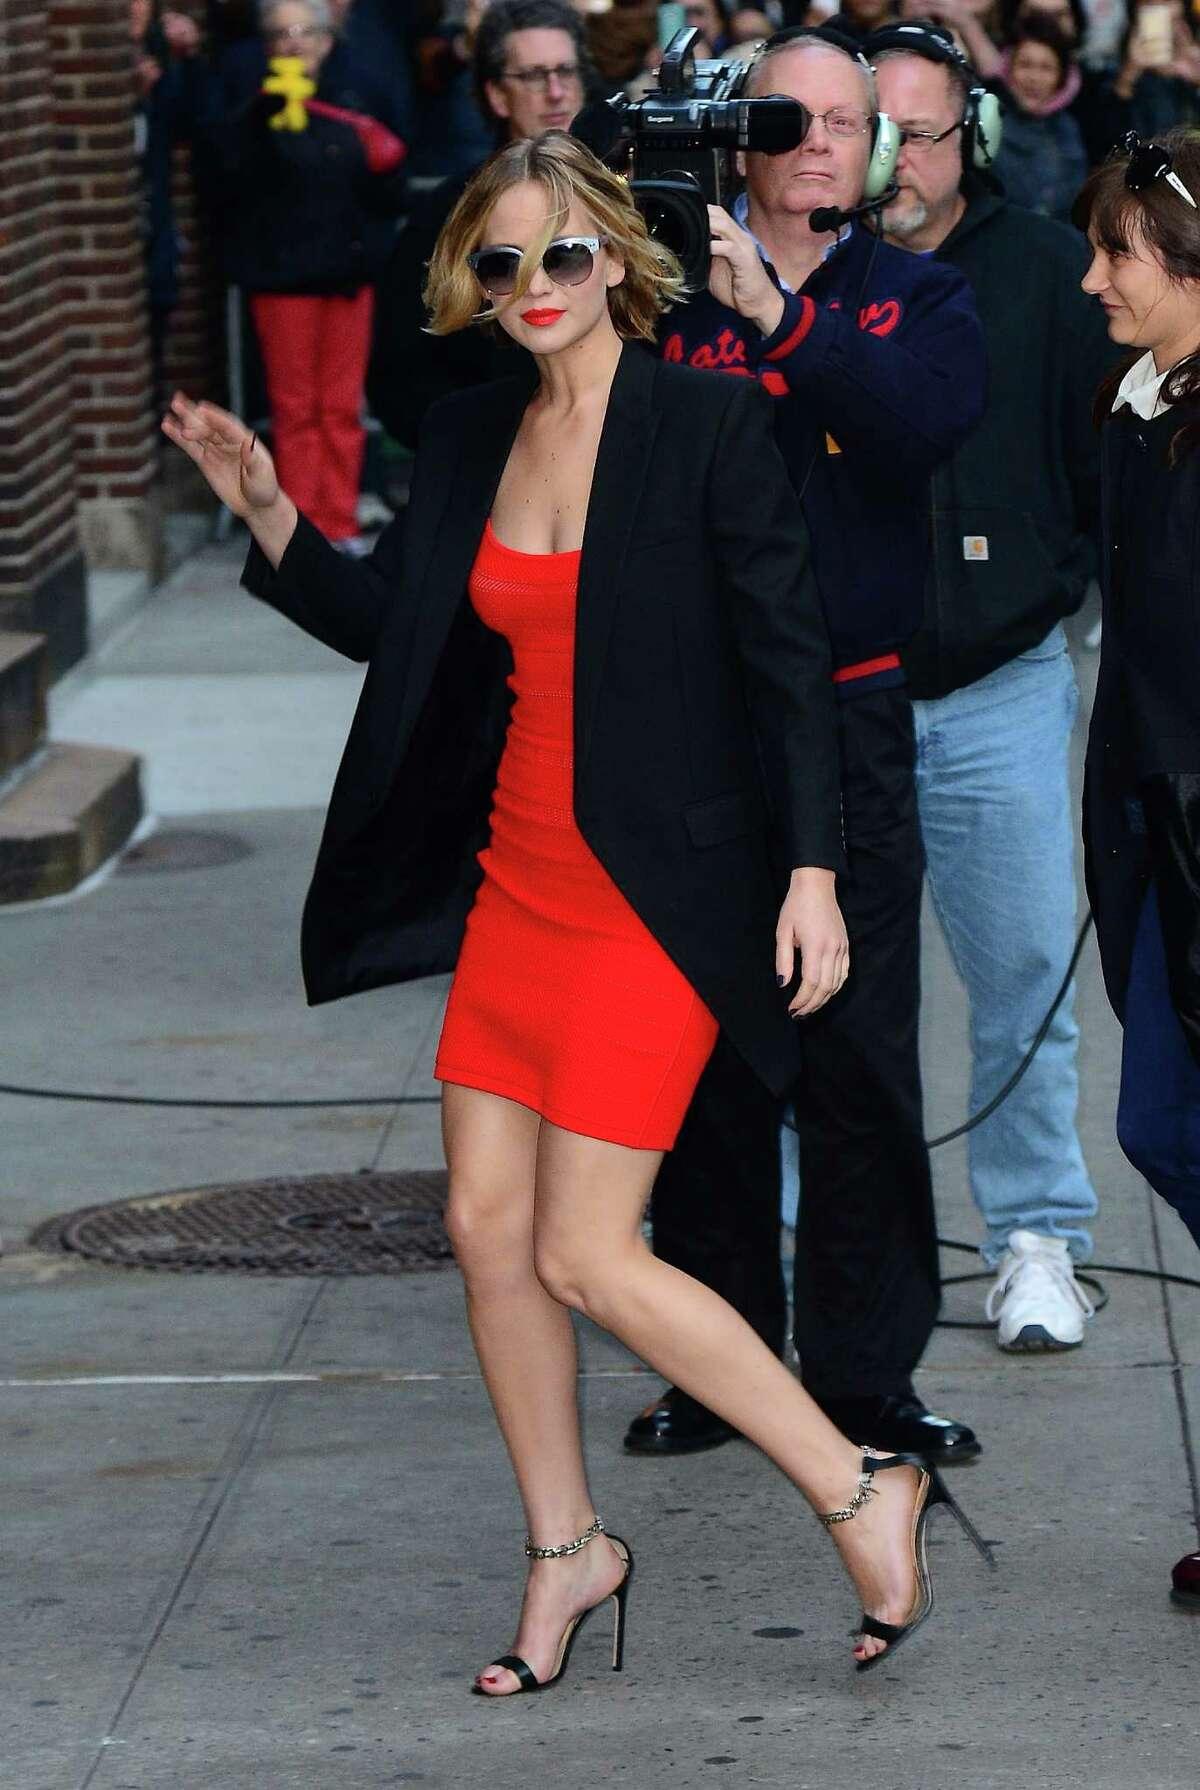 Actress Jennifer Lawrence arrived at